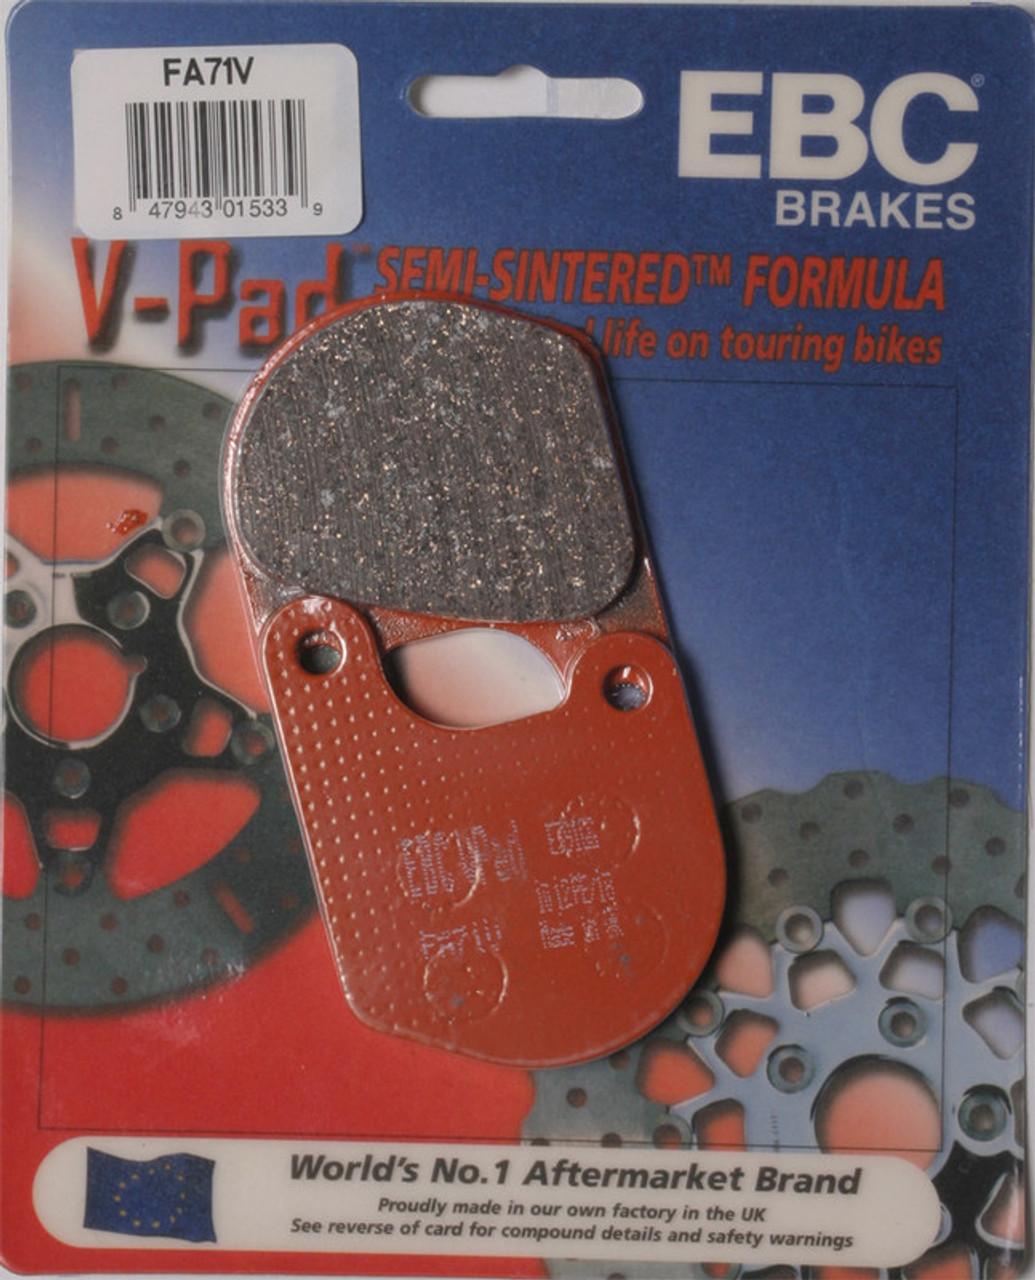 Ebc Brake Pads >> Ebc Brake Pads Fa71v